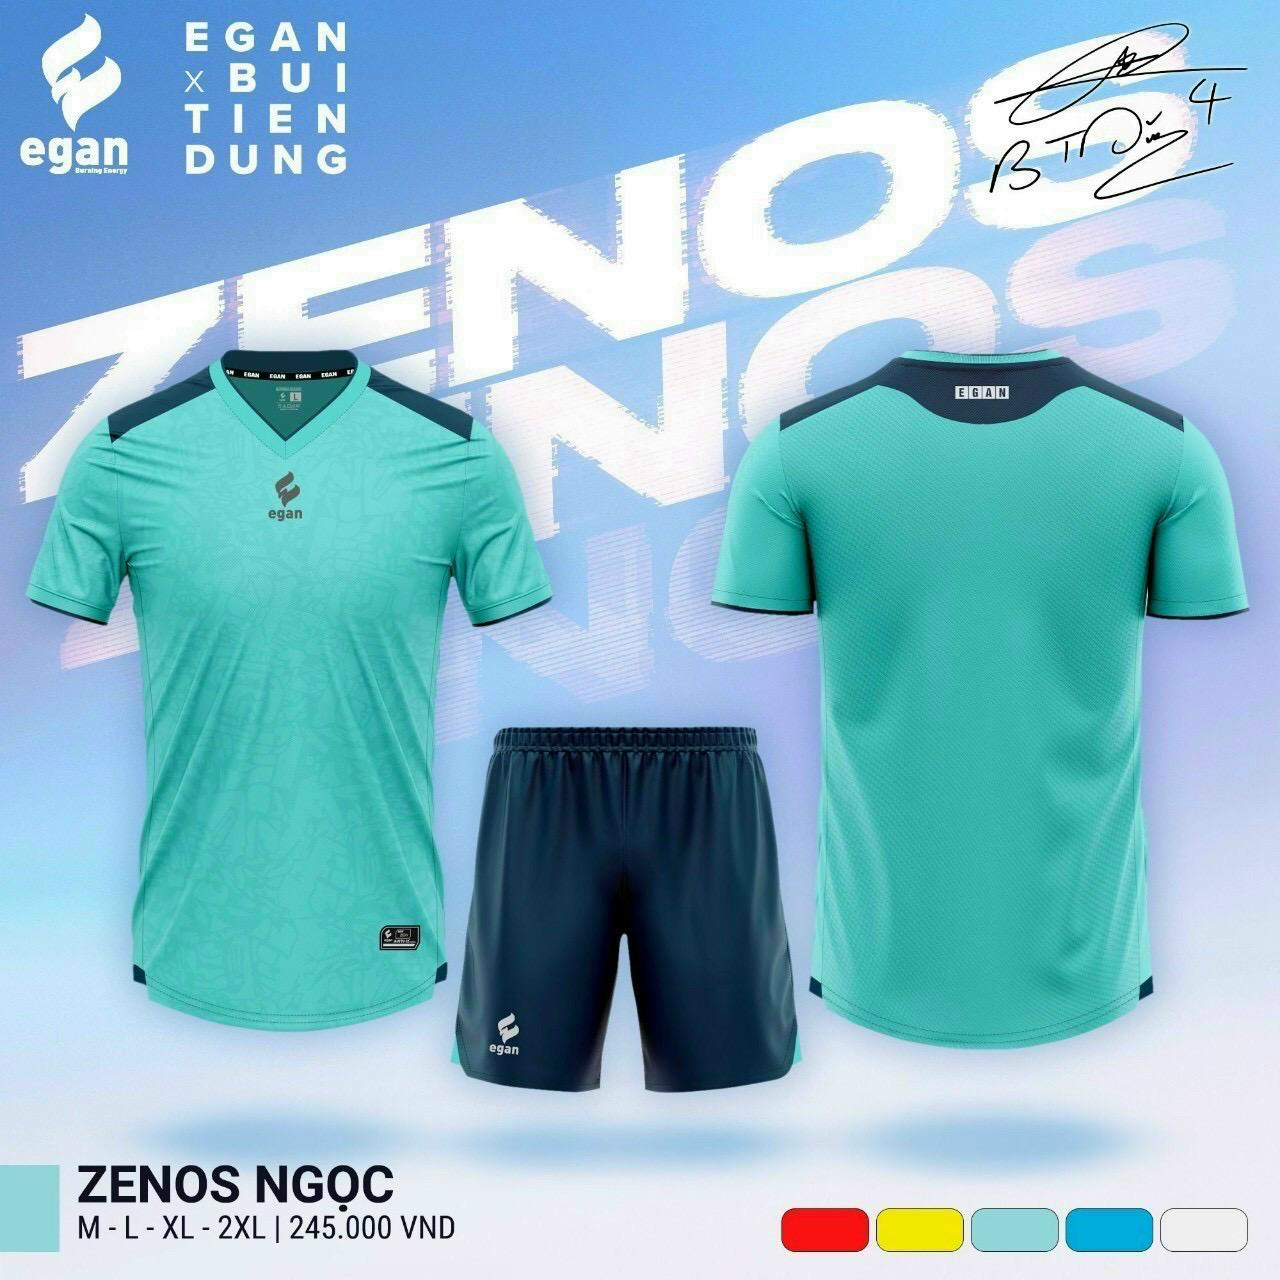 Quần áo bóng đá Egan Zenos